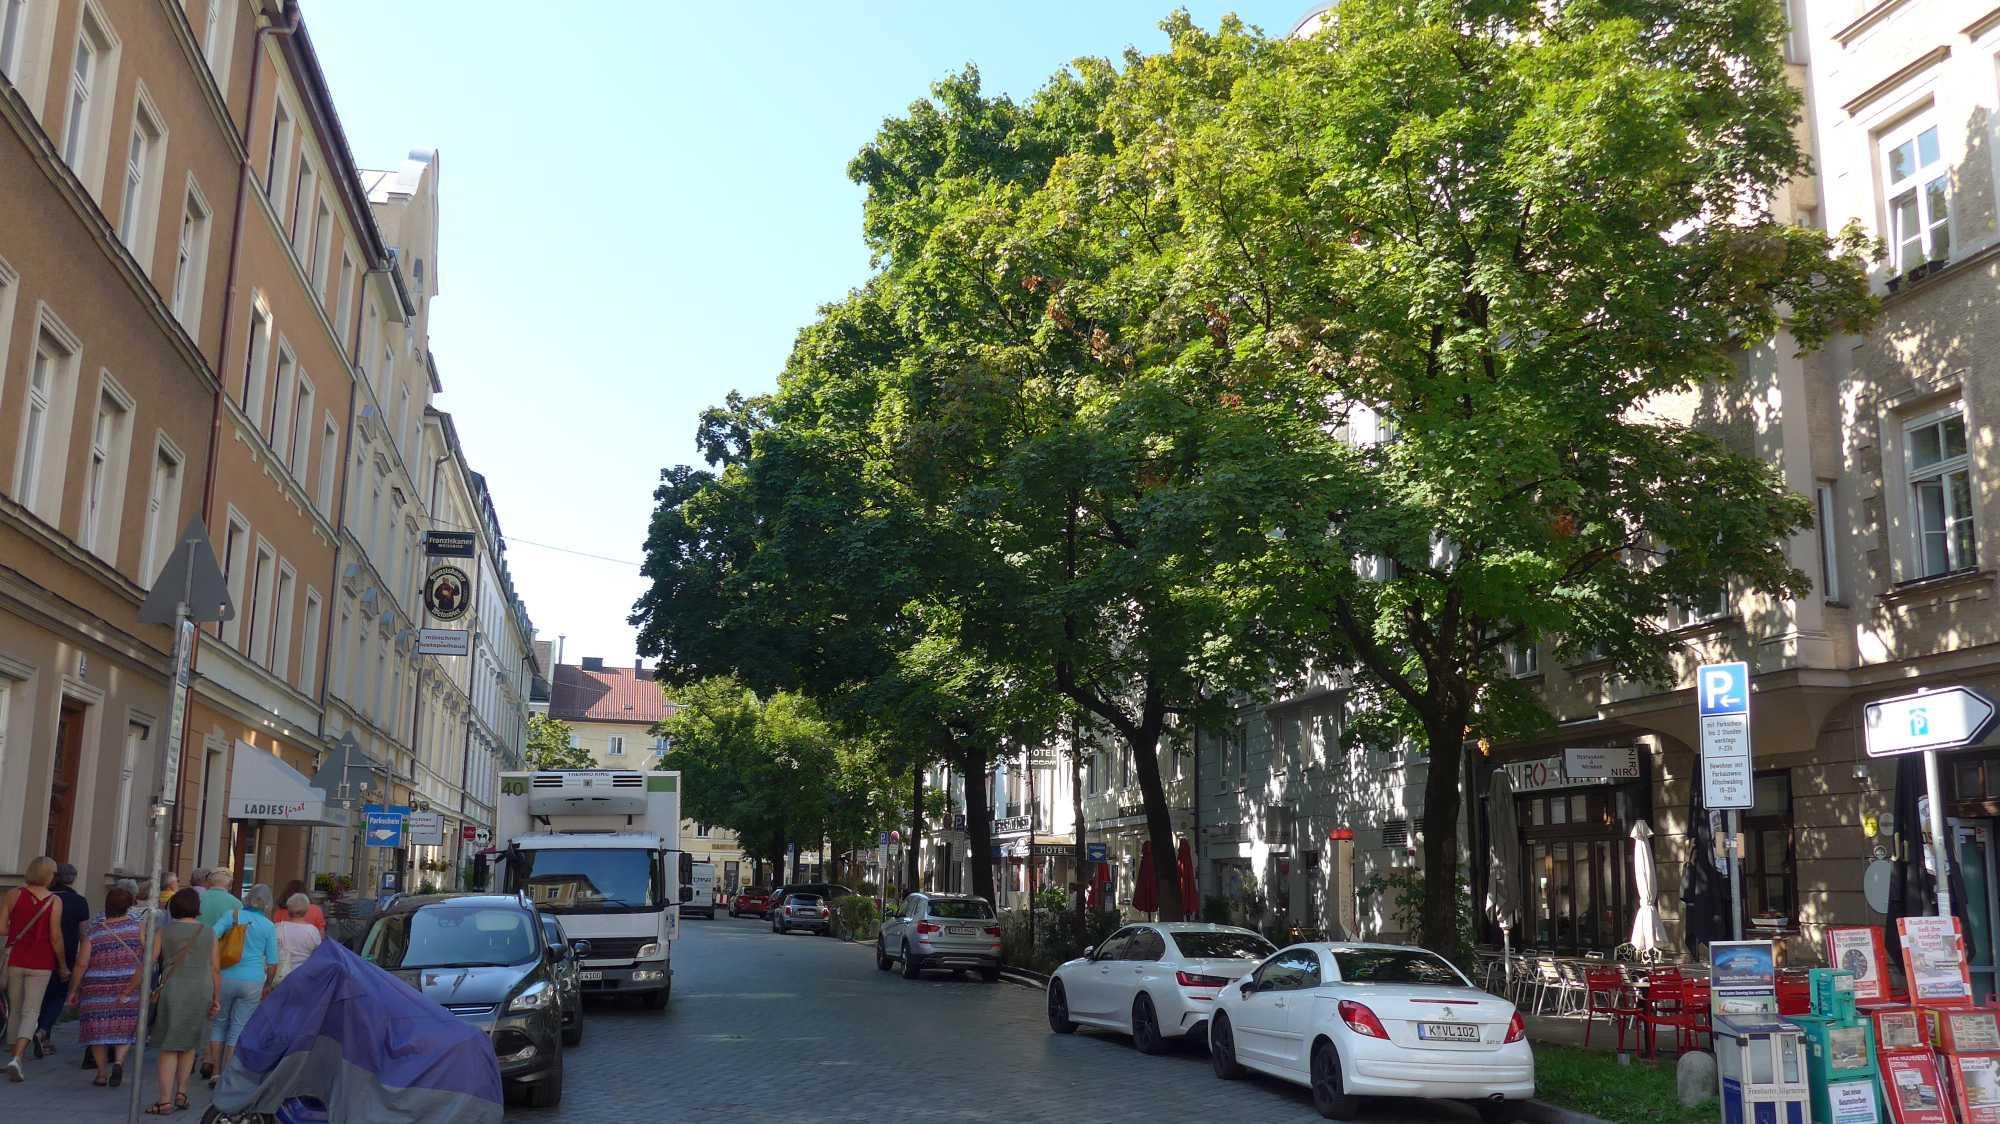 Occamstraße